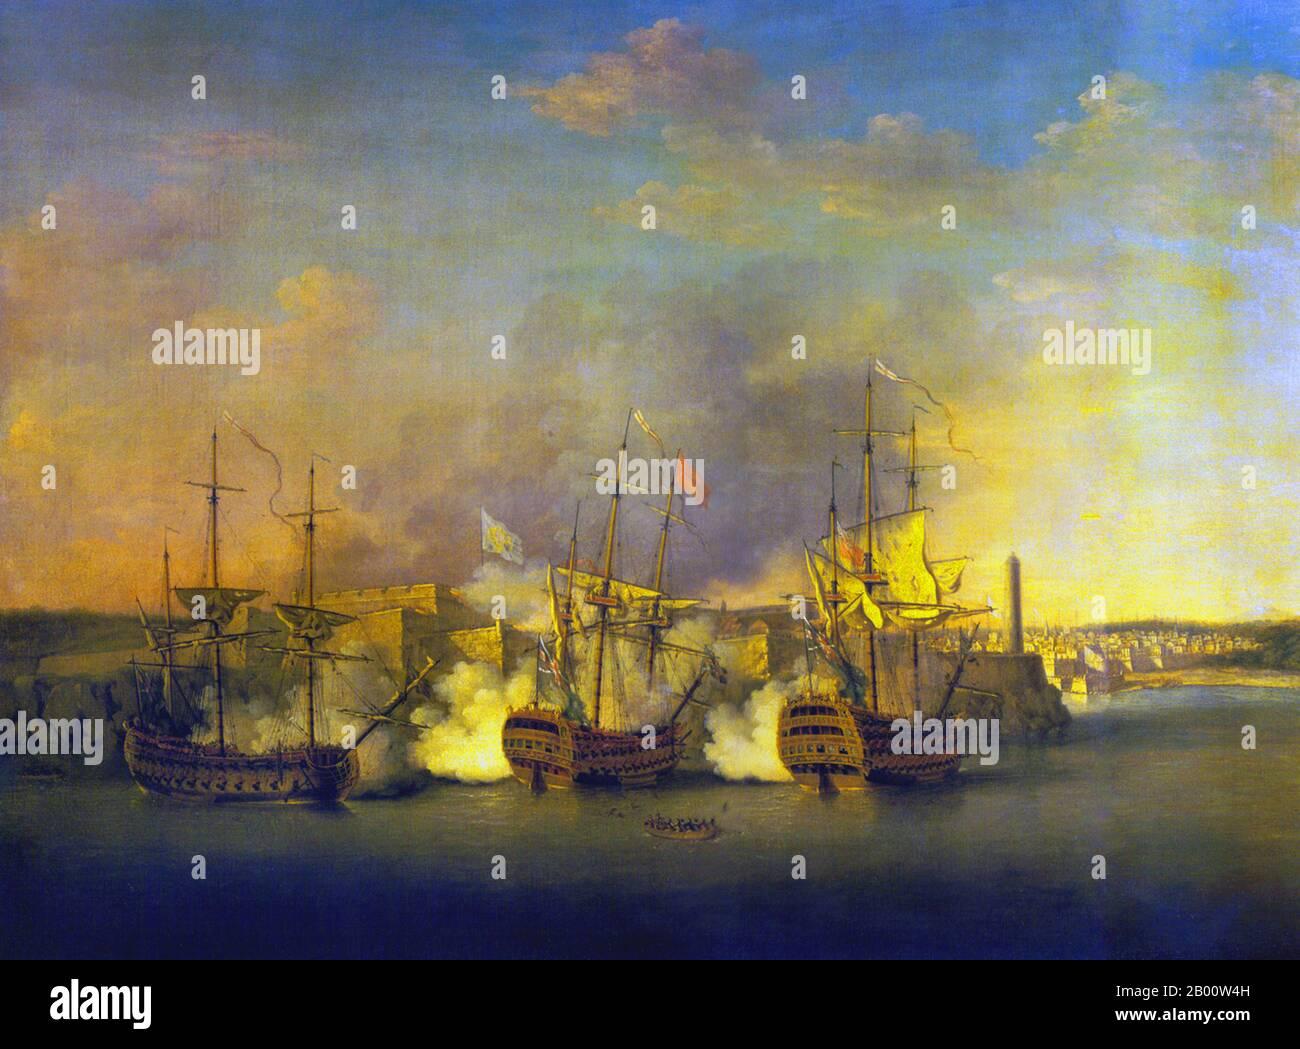 7 YEARS WAR BRITISH CAPTURE OF HAVANA CUBA SPAIN PAINTING ART REAL CANVAS PRINT